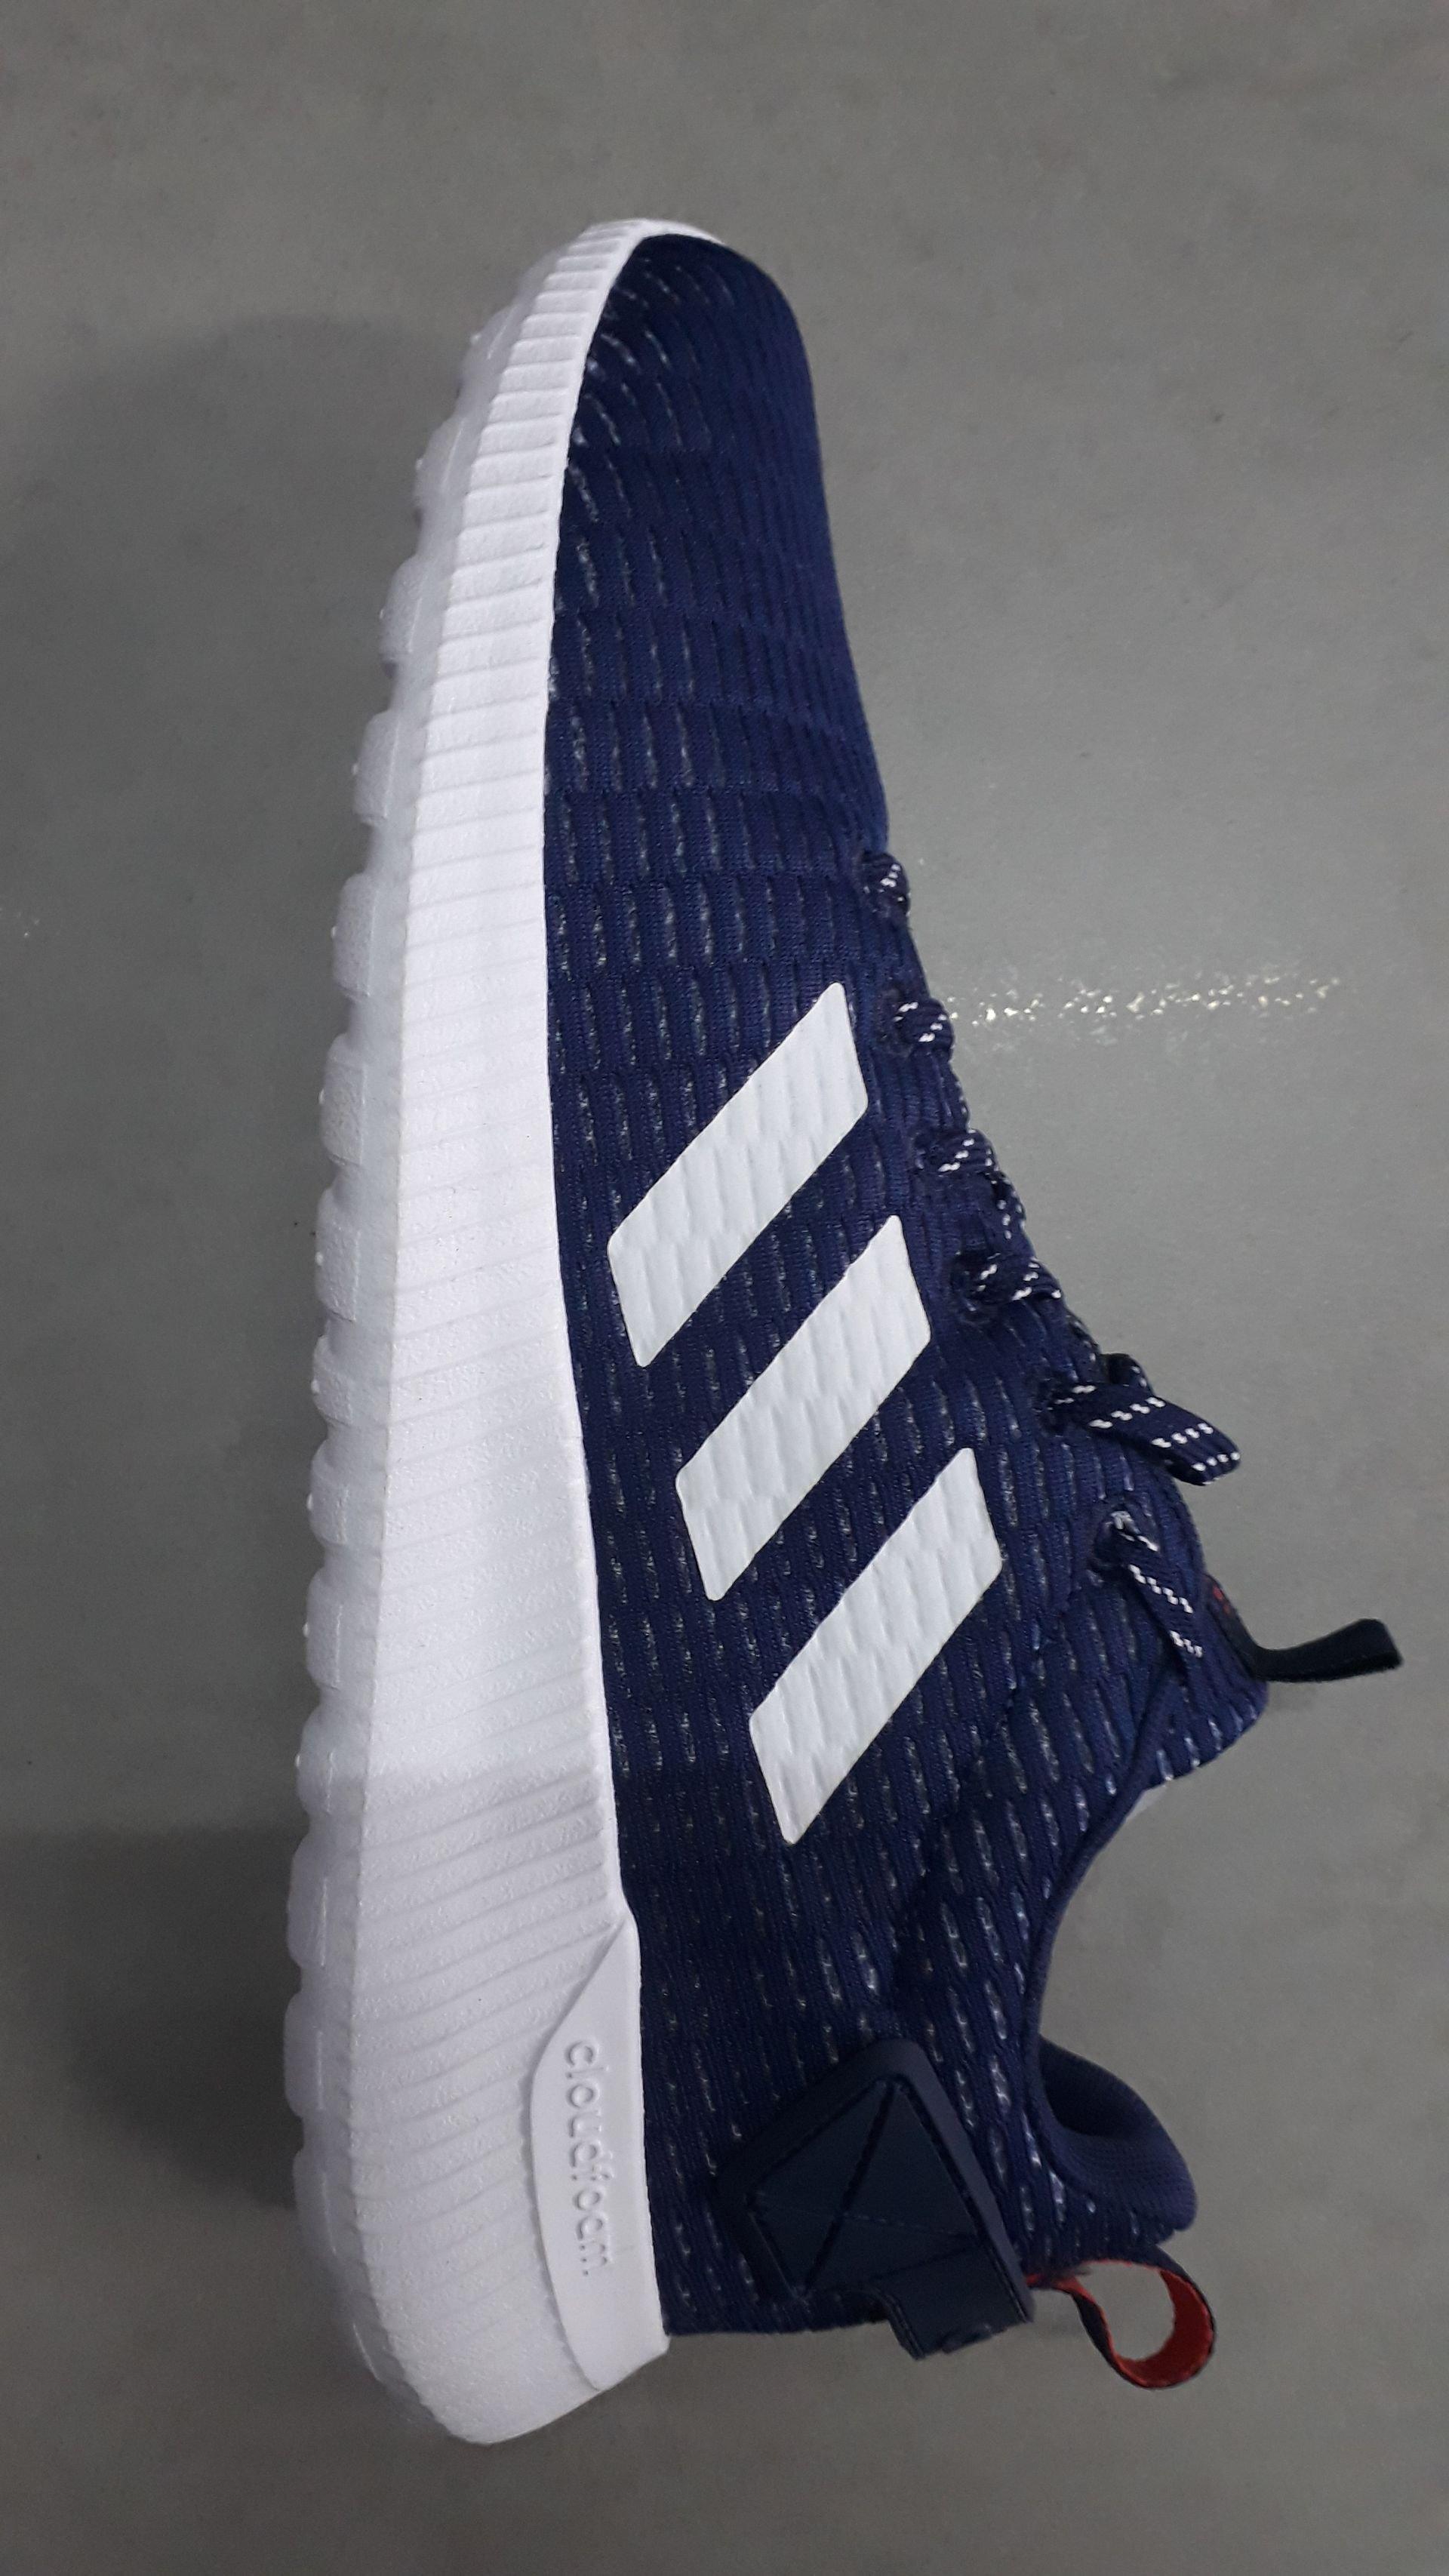 Adidas man